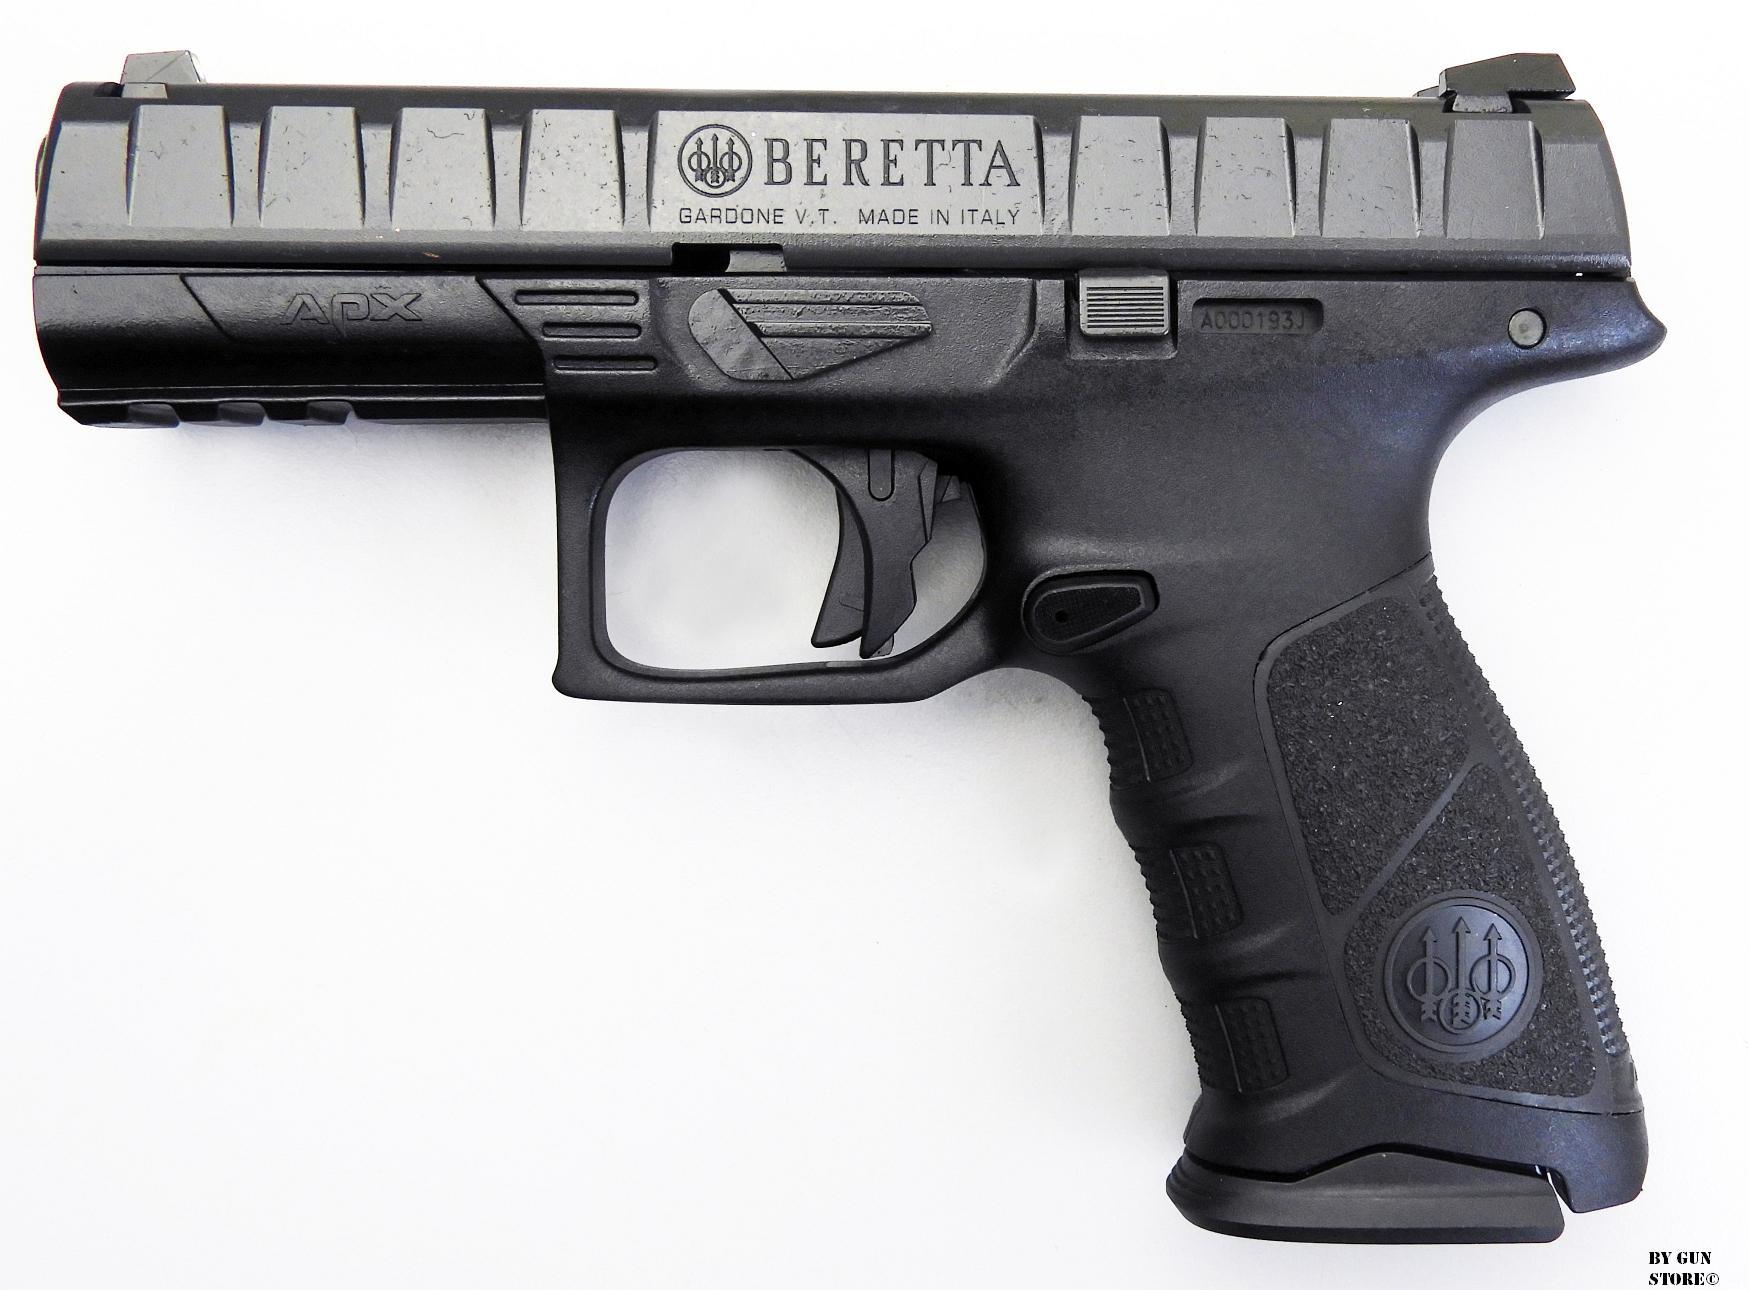 Gun Store Bunker Ego Sum Bellum Pistola Beretta Mod Apx Cal